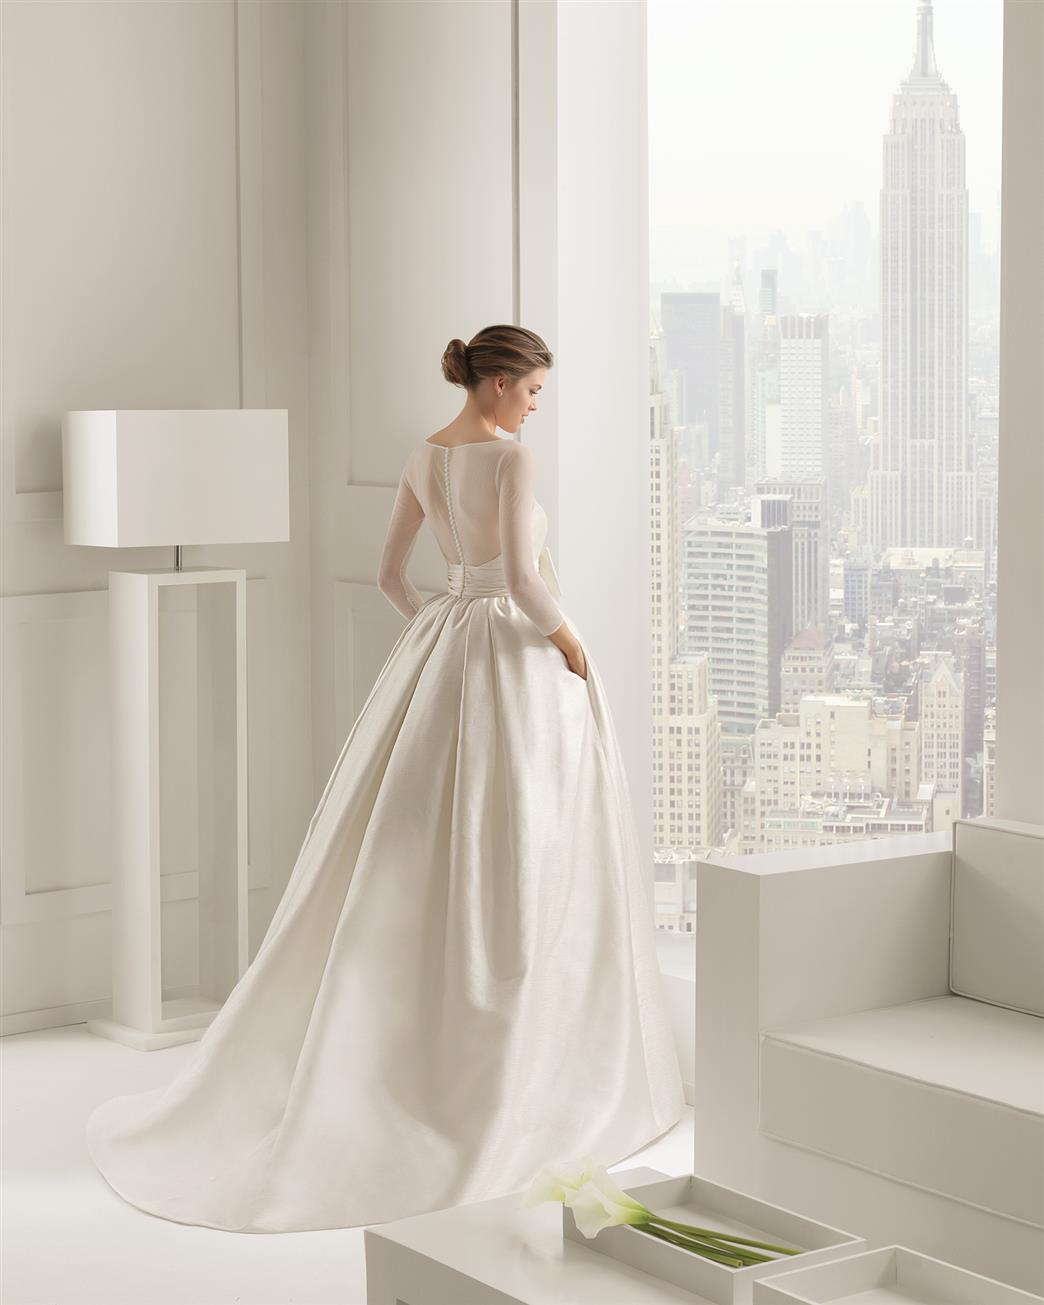 a7edd63ccd Long Sleeve Wedding Dress from Rosa Clara 2015 Collection - Segovia ...